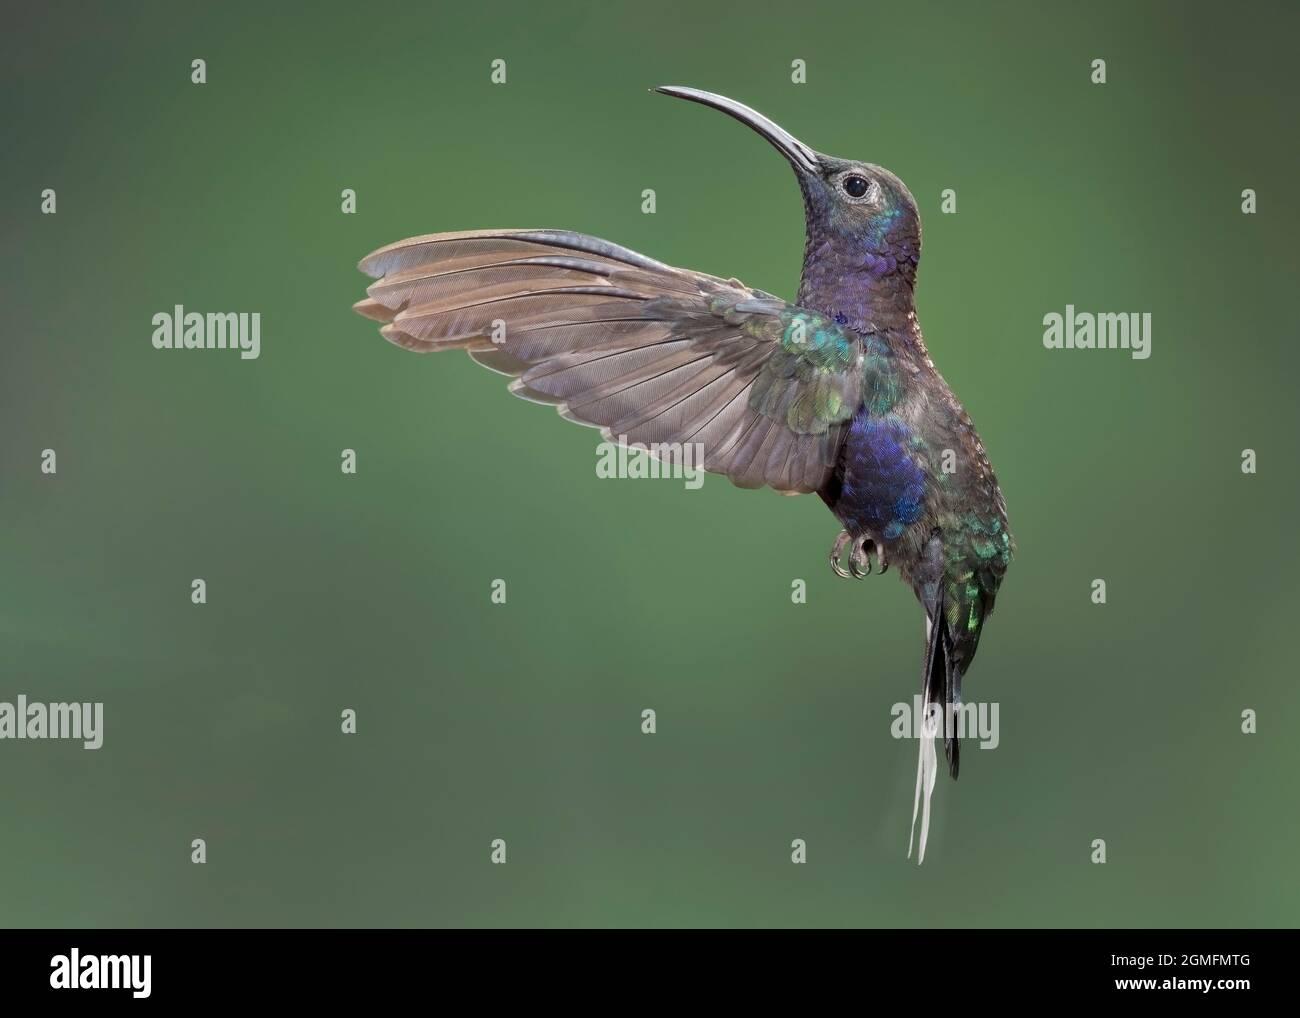 Violet Sabrewing (Campylopterus hemileucurus) hummingbird hovering, Costa Rica Stock Photo